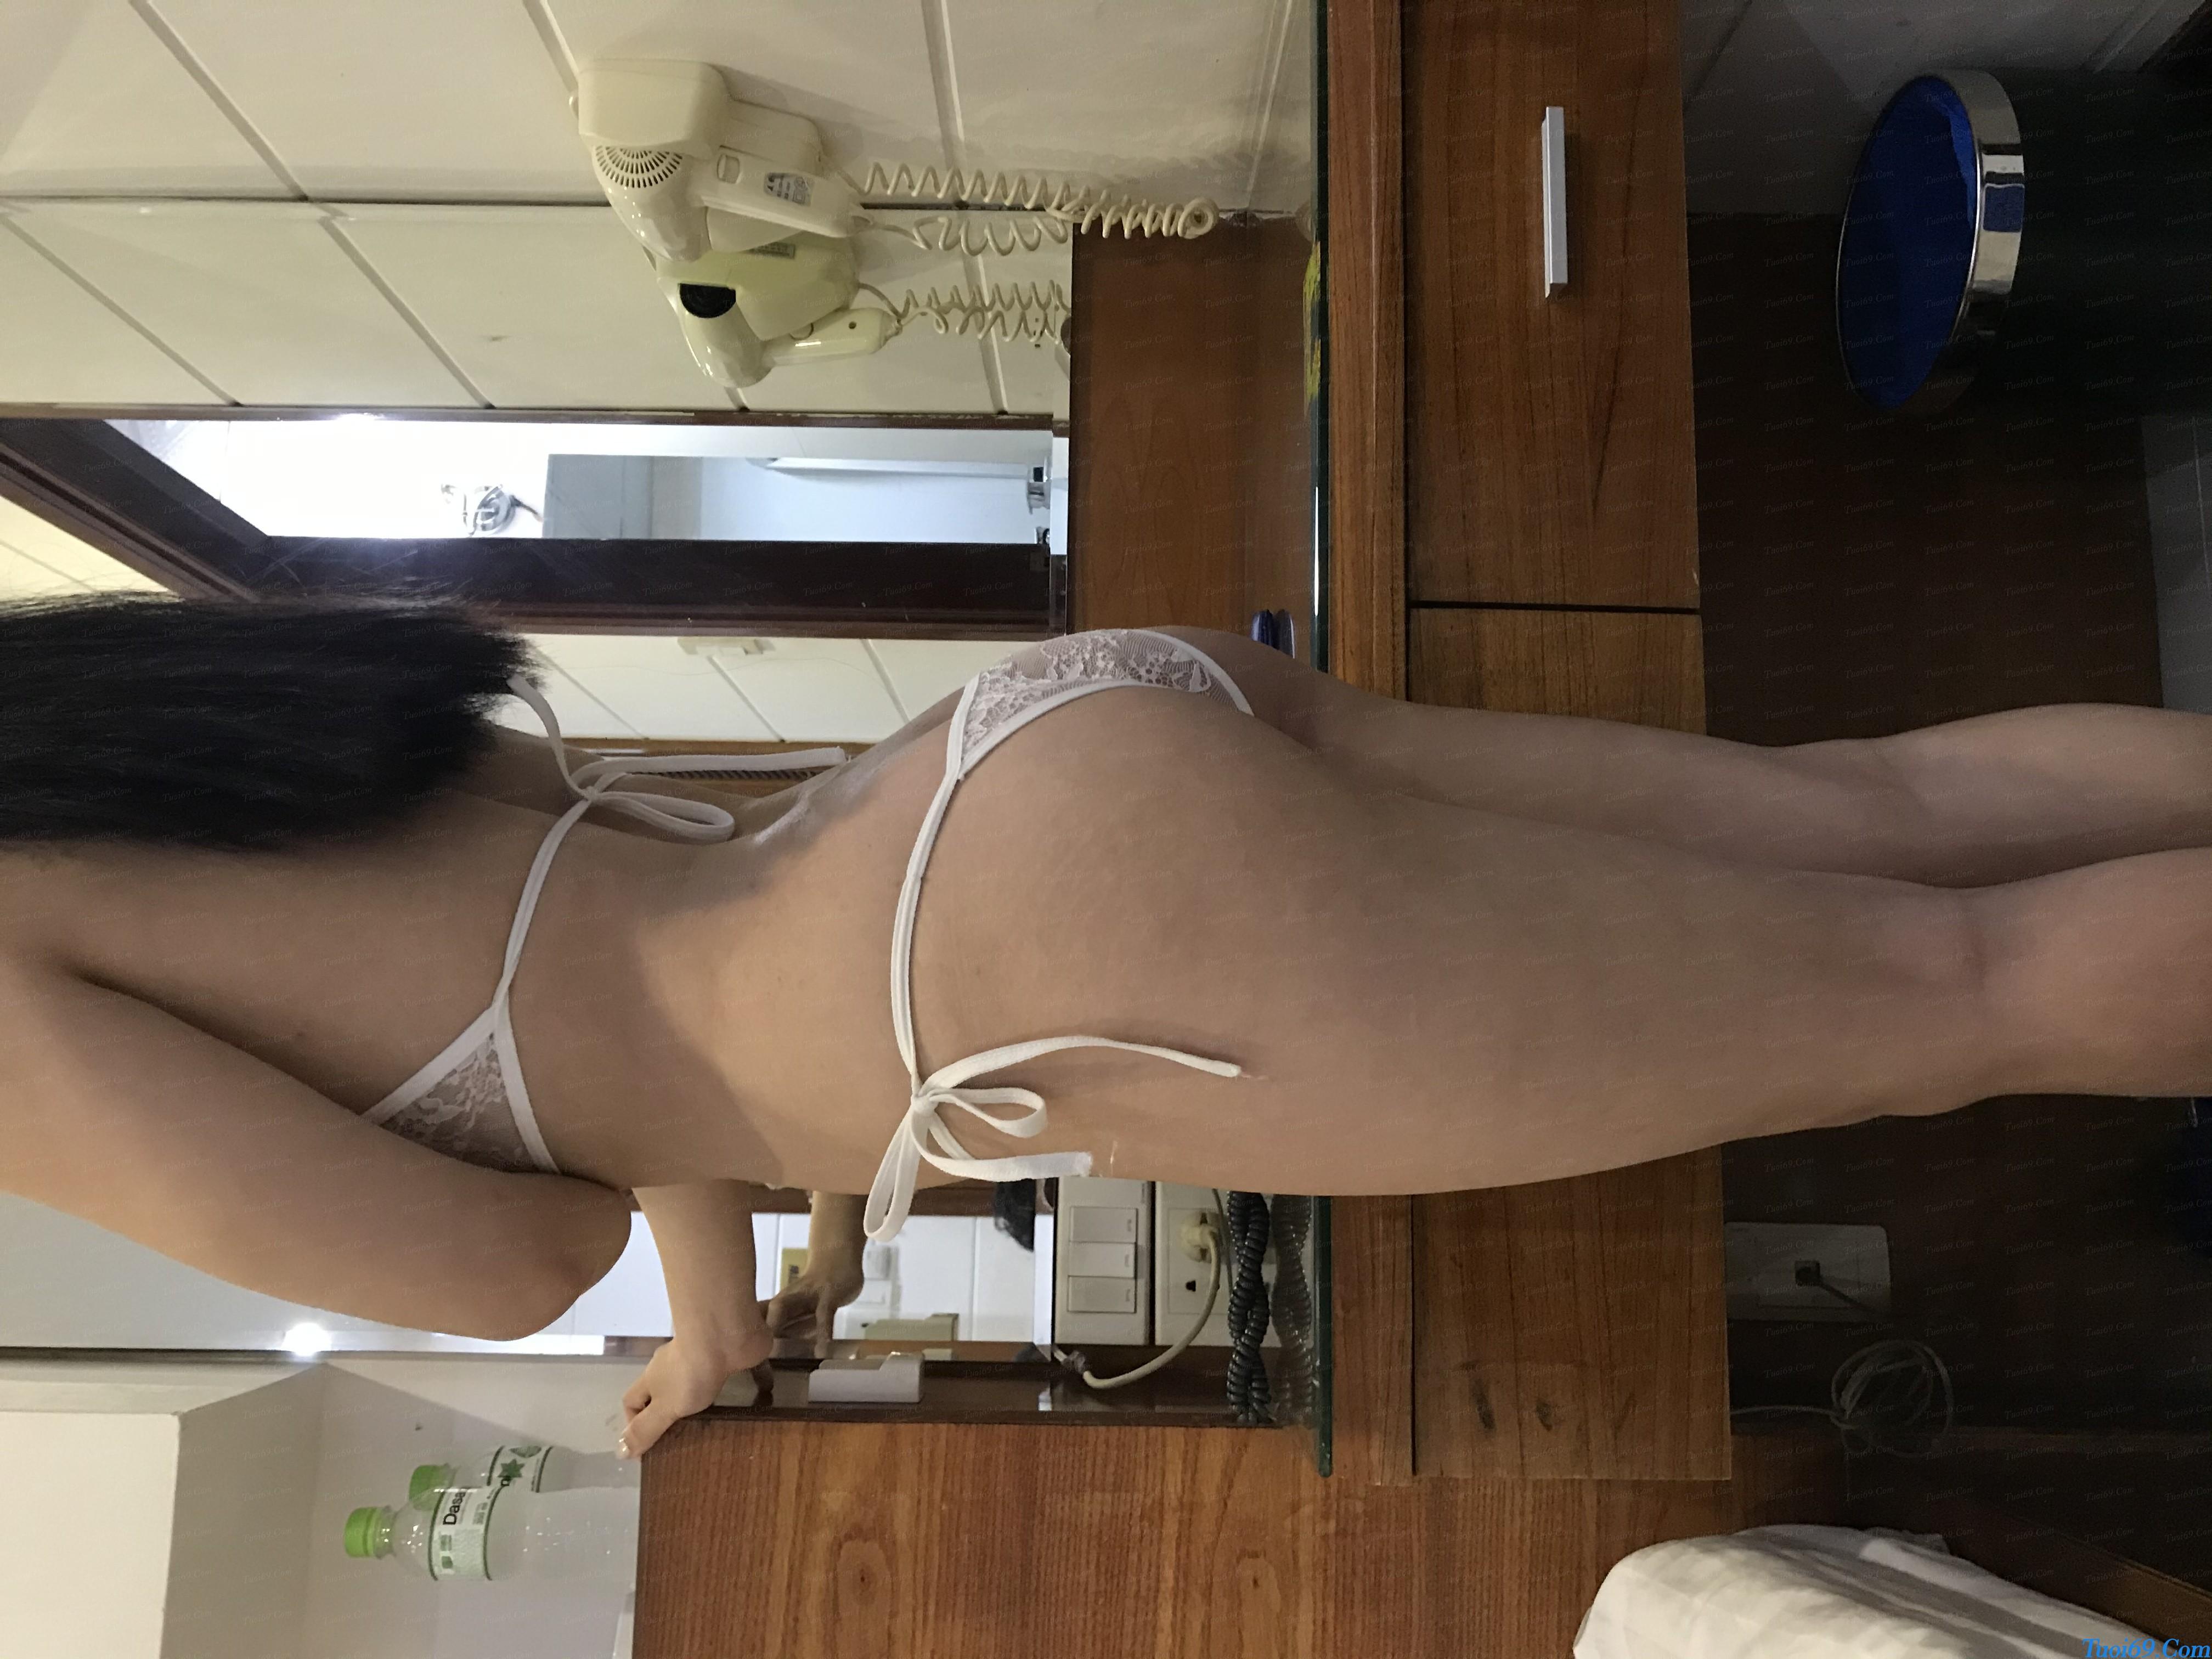 tuoi69com-review-em-gai-goi-hae-ri-thien-than-xinh-dep-quyen-ru-nhu-jav-star-28